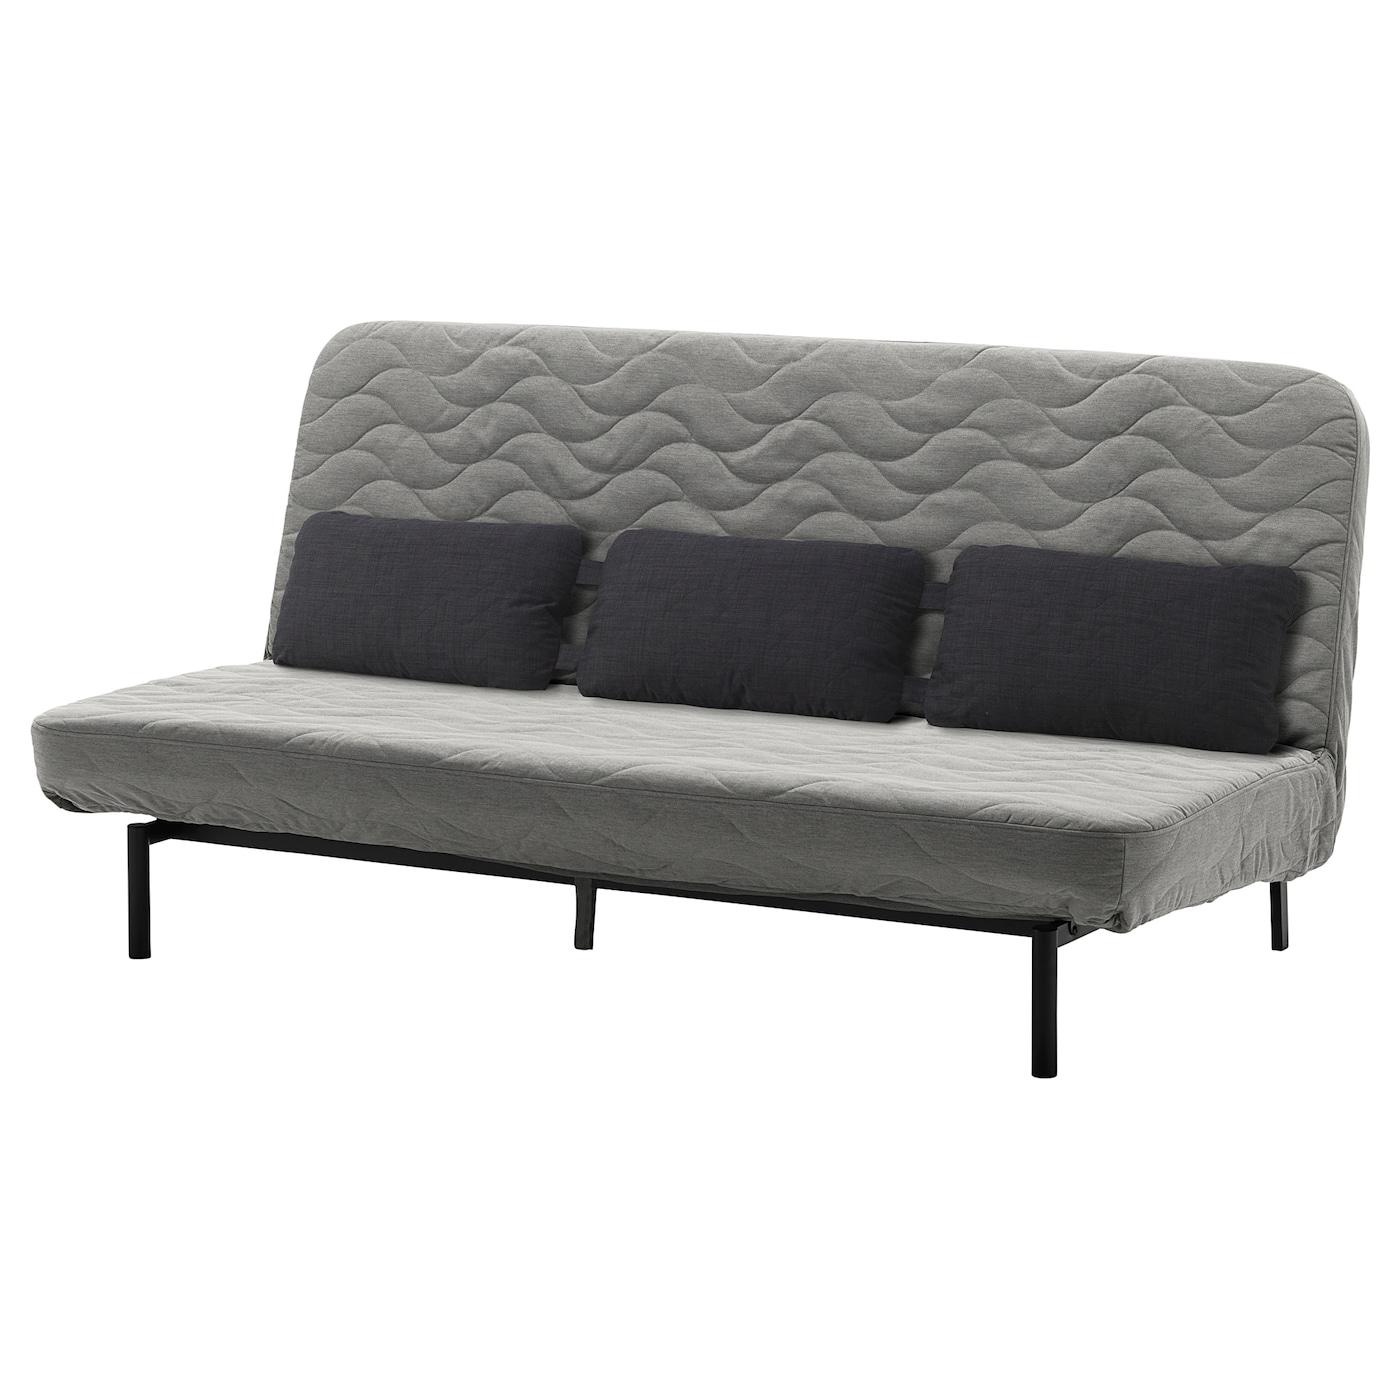 slaapbanken ikea. Black Bedroom Furniture Sets. Home Design Ideas